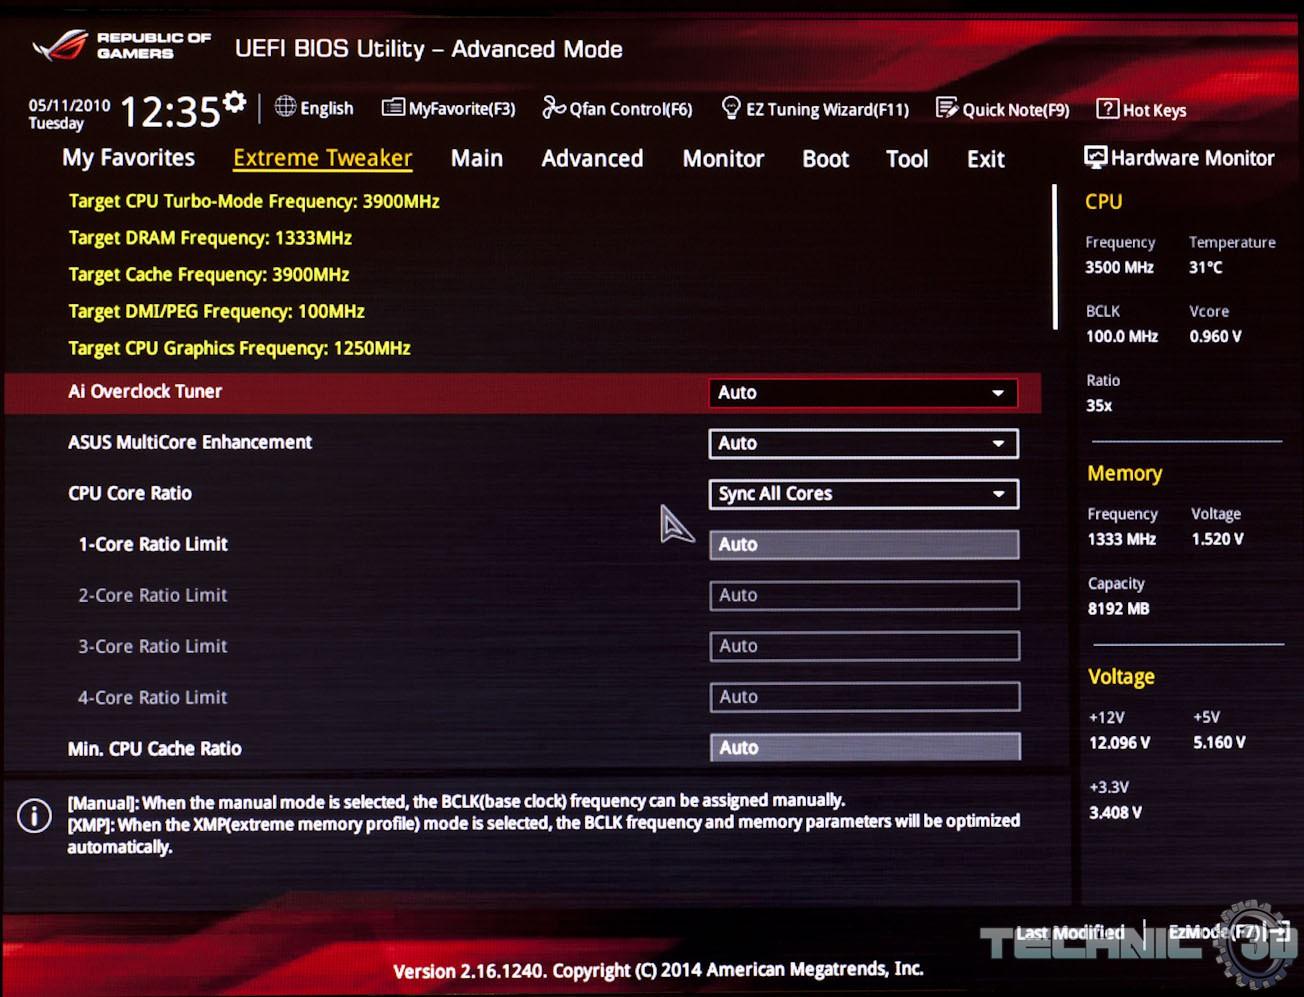 How to update Asus Maximus VII Hero BIOS - YouTube